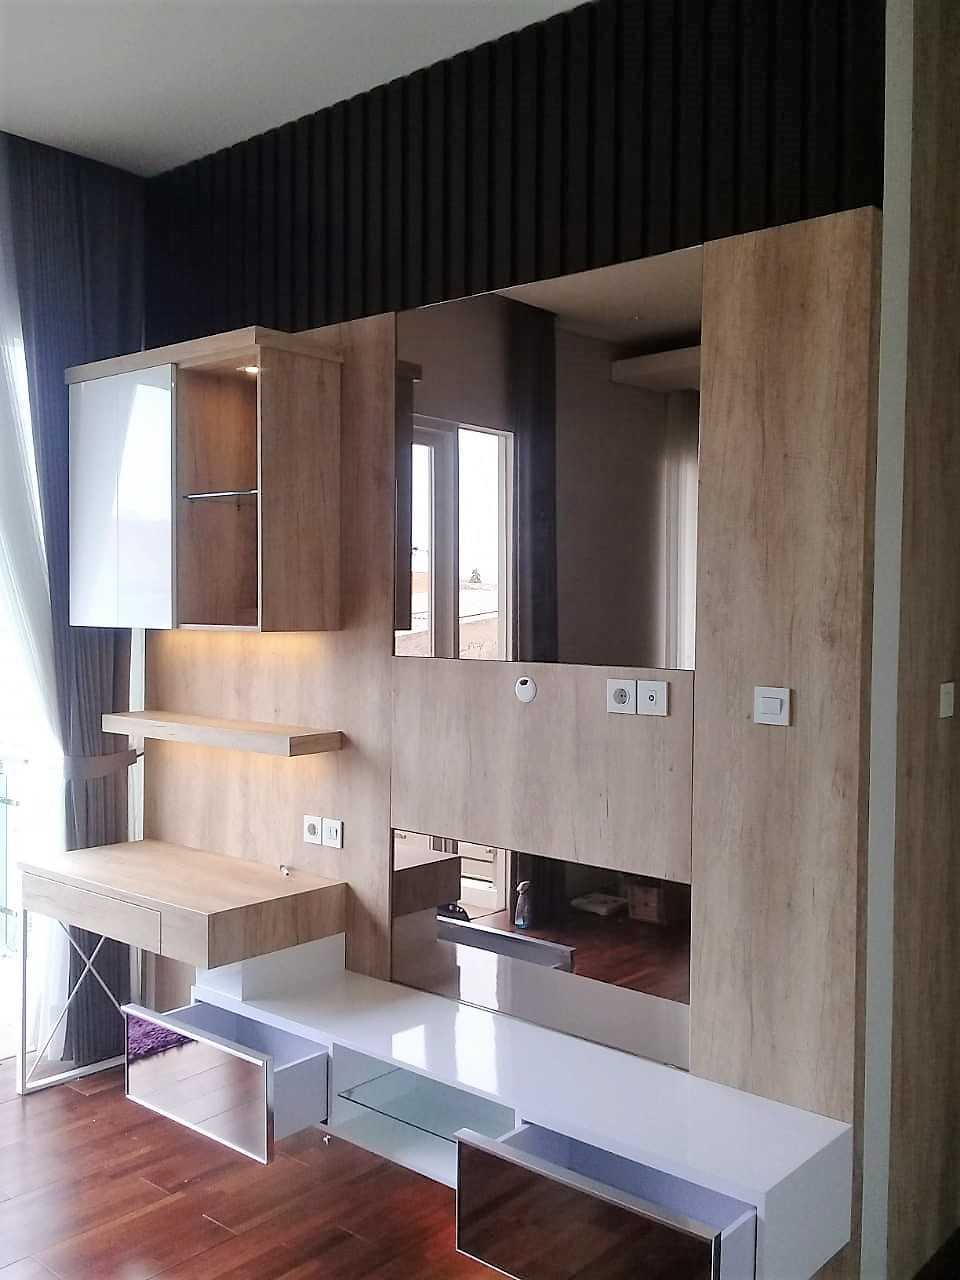 Aditya Wira Hardi Modern Master Bedroom, Medokan Surabaya Surabaya, Kota Sby, Jawa Timur, Indonesia Surabaya, Kota Sby, Jawa Timur, Indonesia Aditya-Wira-Hardi-Modern-Master-Bedroom-Medokan-Surabaya   65950